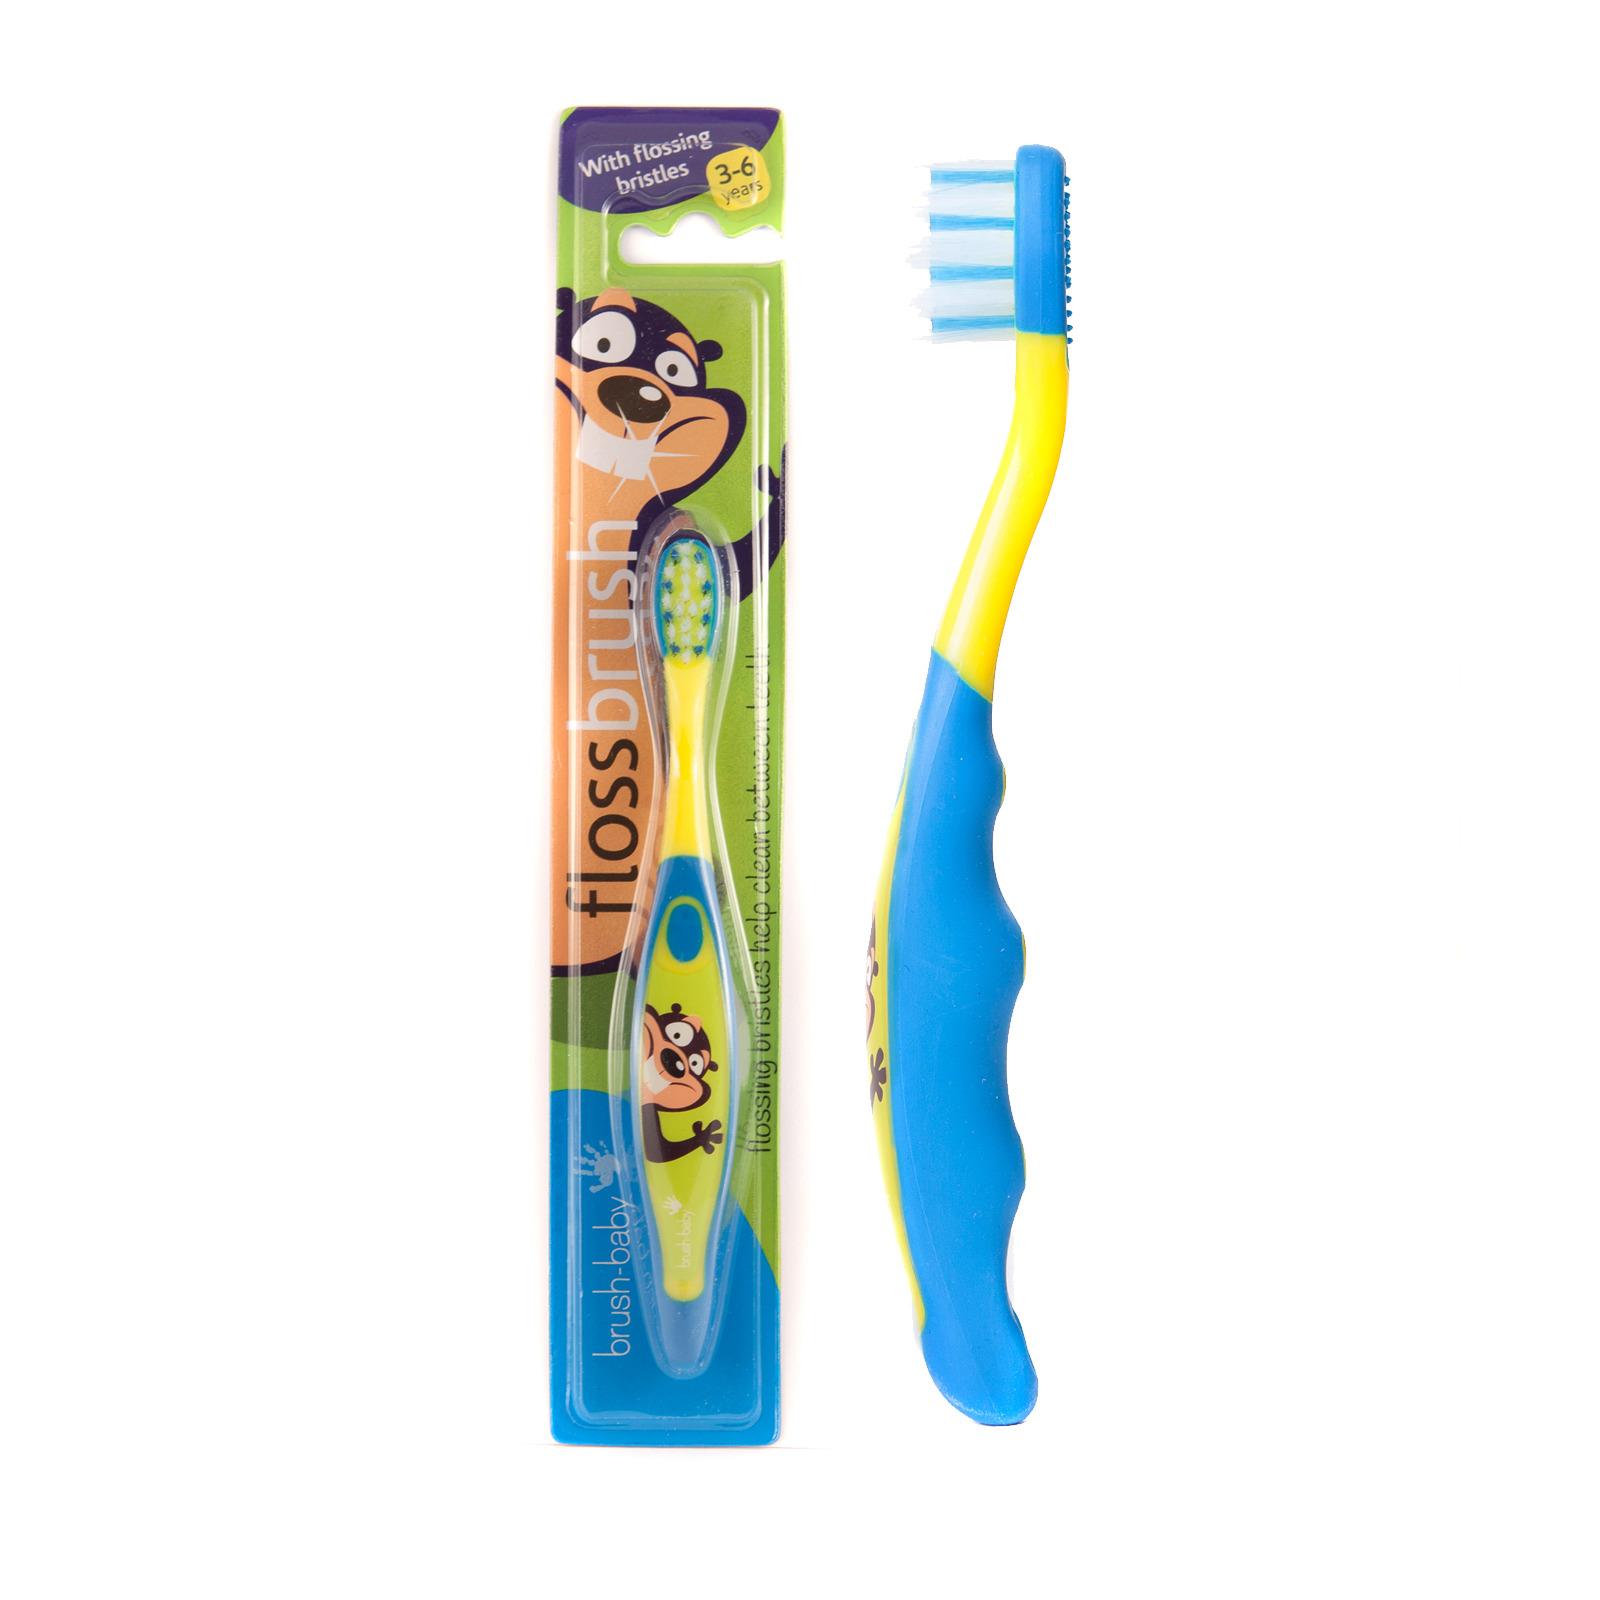 Brush-Baby Floss Brush 3-6 yrs (Pink/Green/Orange/Blue)